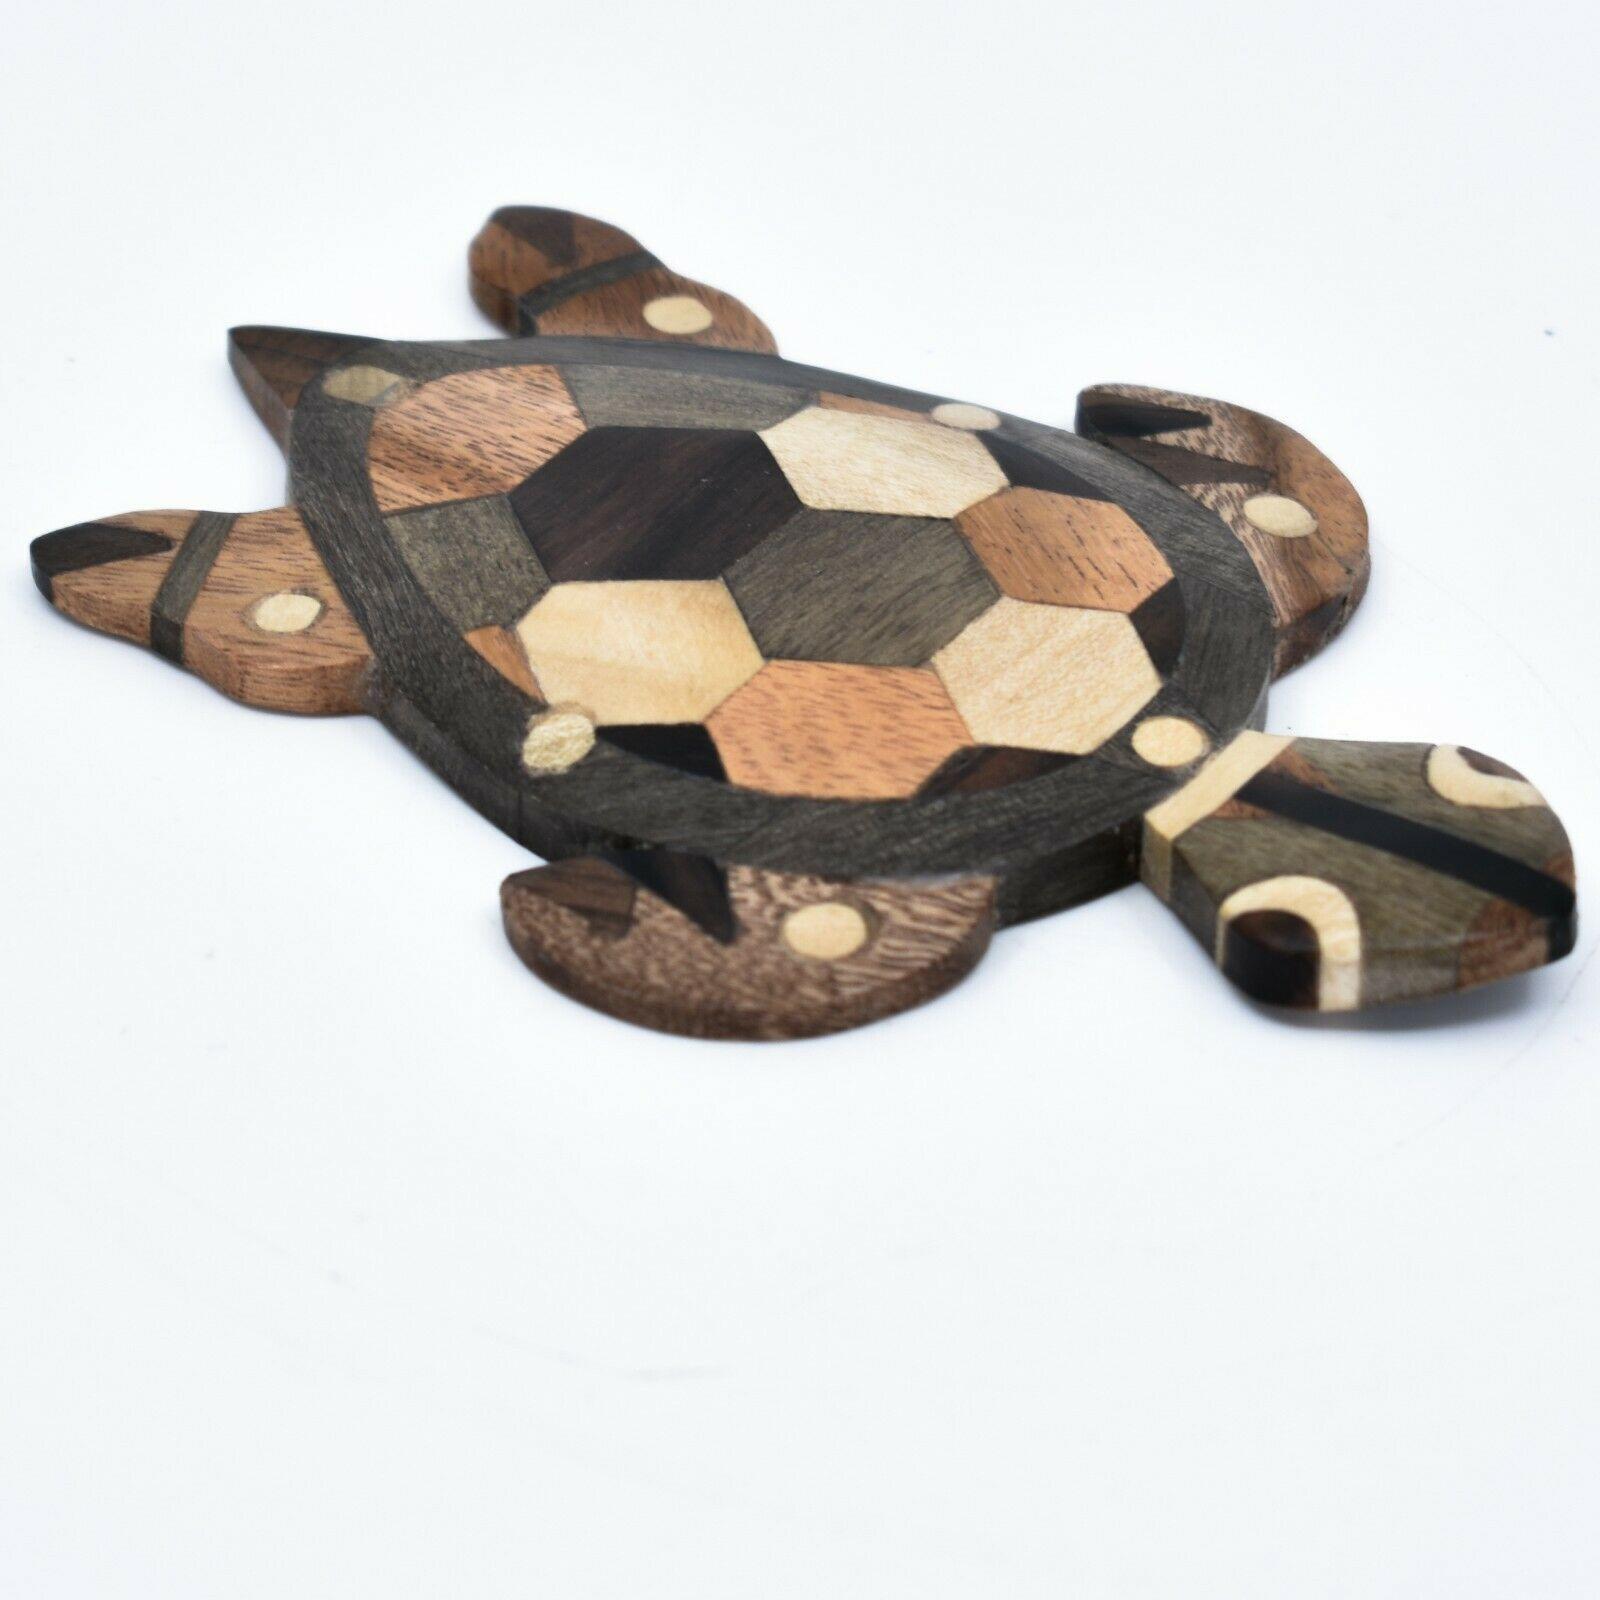 Northwoods Handmade Wooden Parquetry Sea Turtle Sculpture Figurine